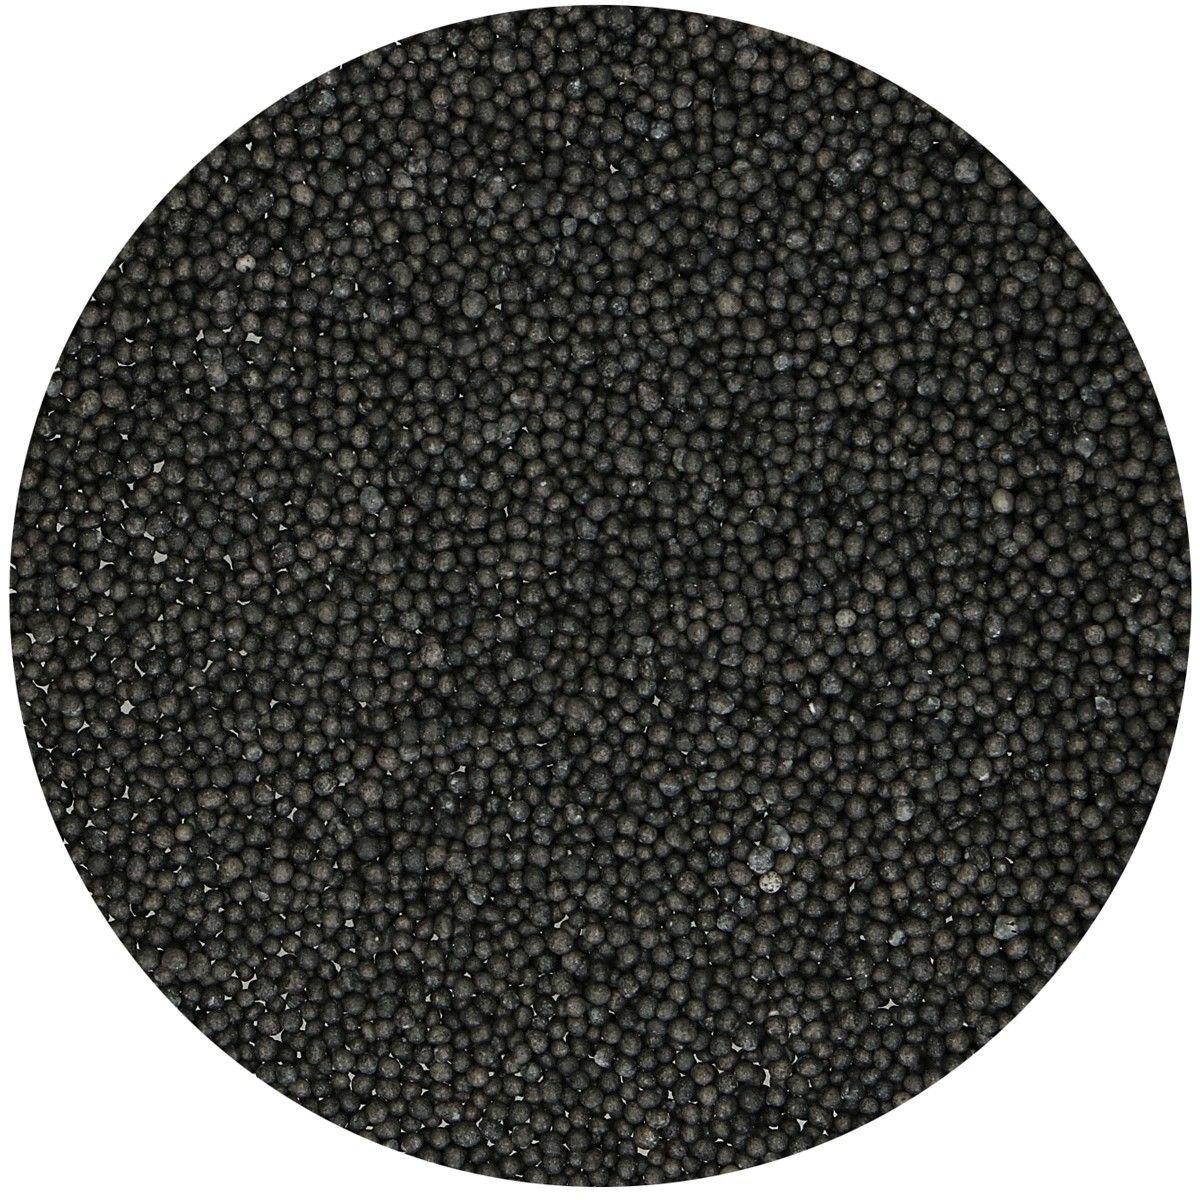 FunCakes Nonpareils -BLACK - Κας-Κας -Μαύρο 80γρ